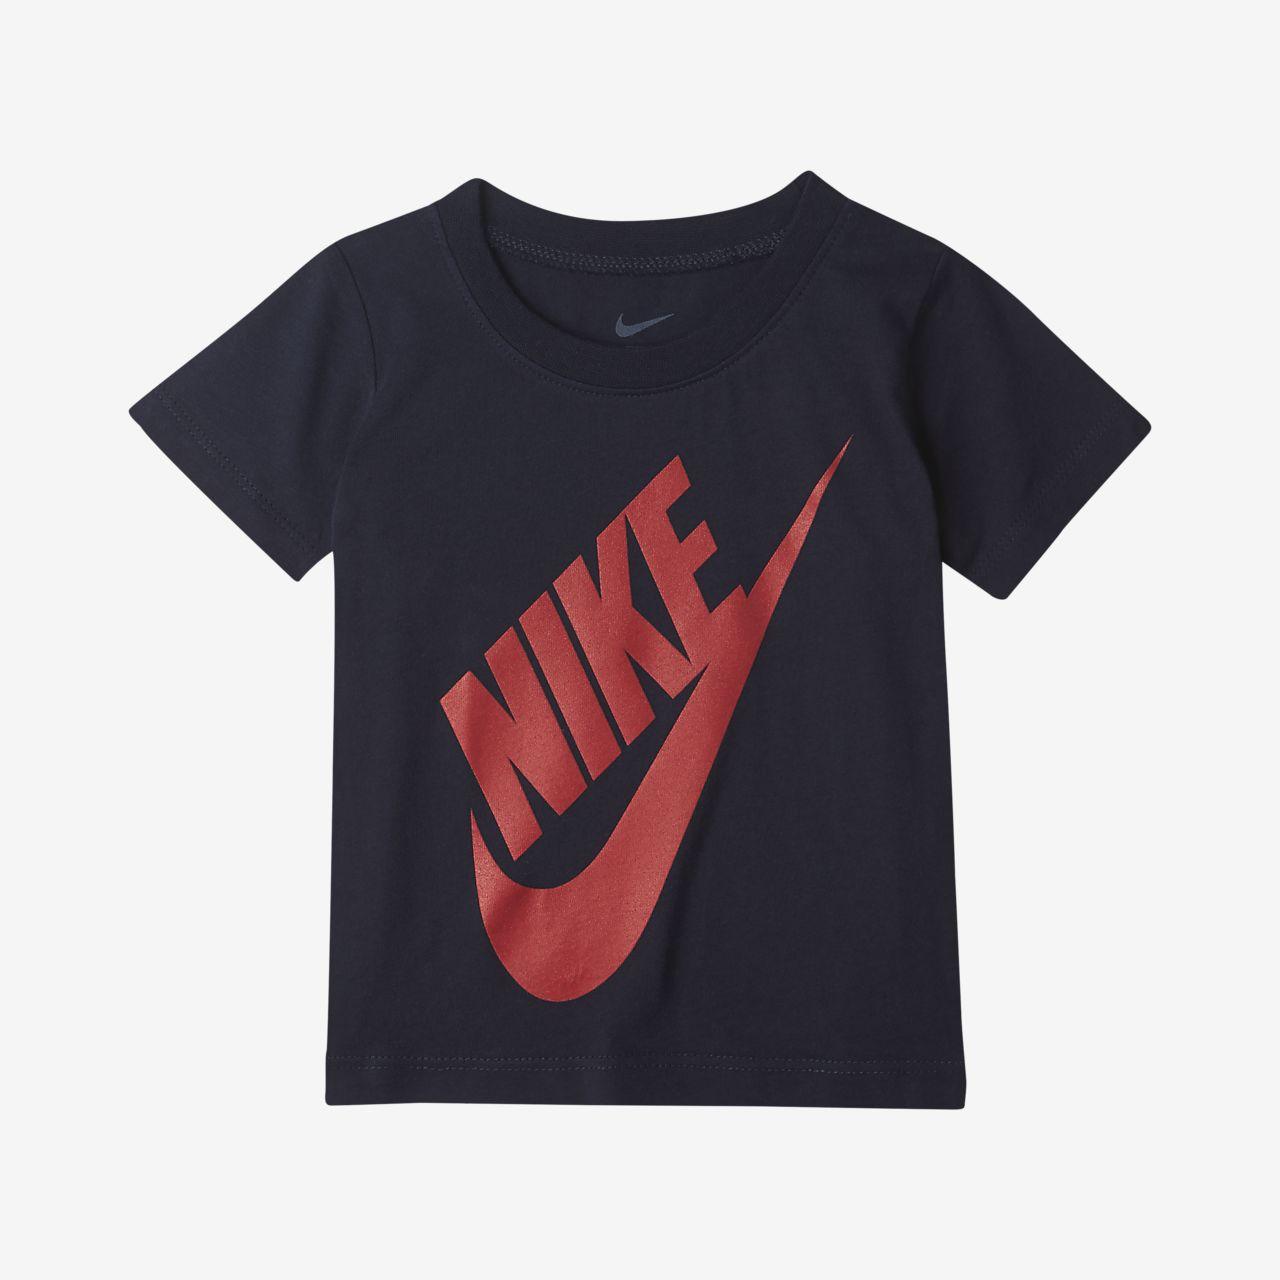 Tee-shirt Nike Sportswear pour Bébé (12 - 24 mois)